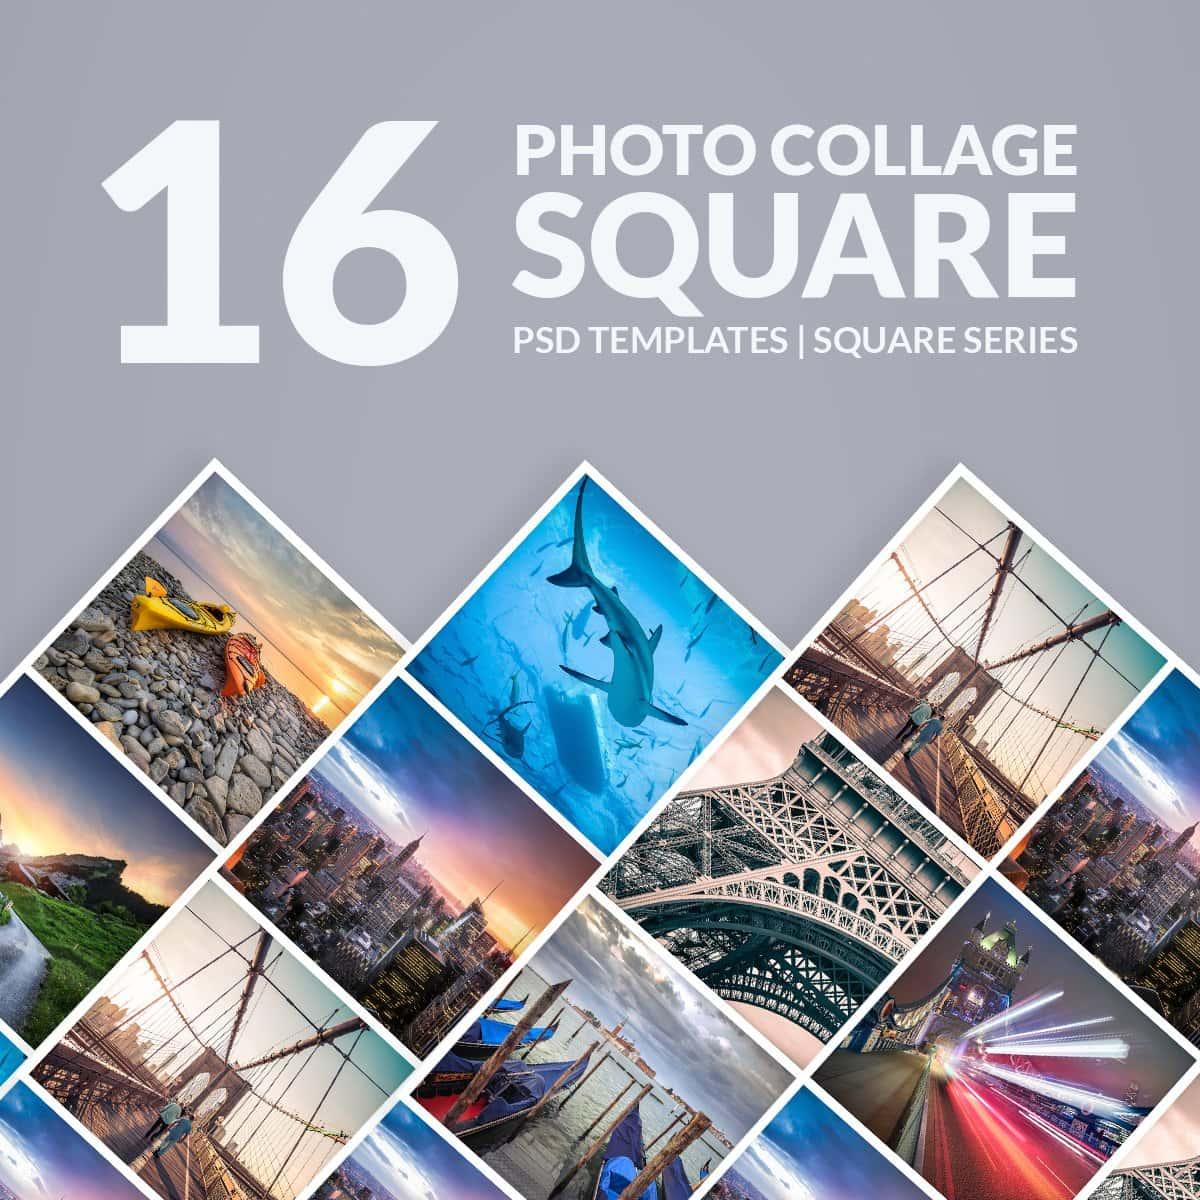 Presetpro Photoshop Templates Photo Collage Square Series